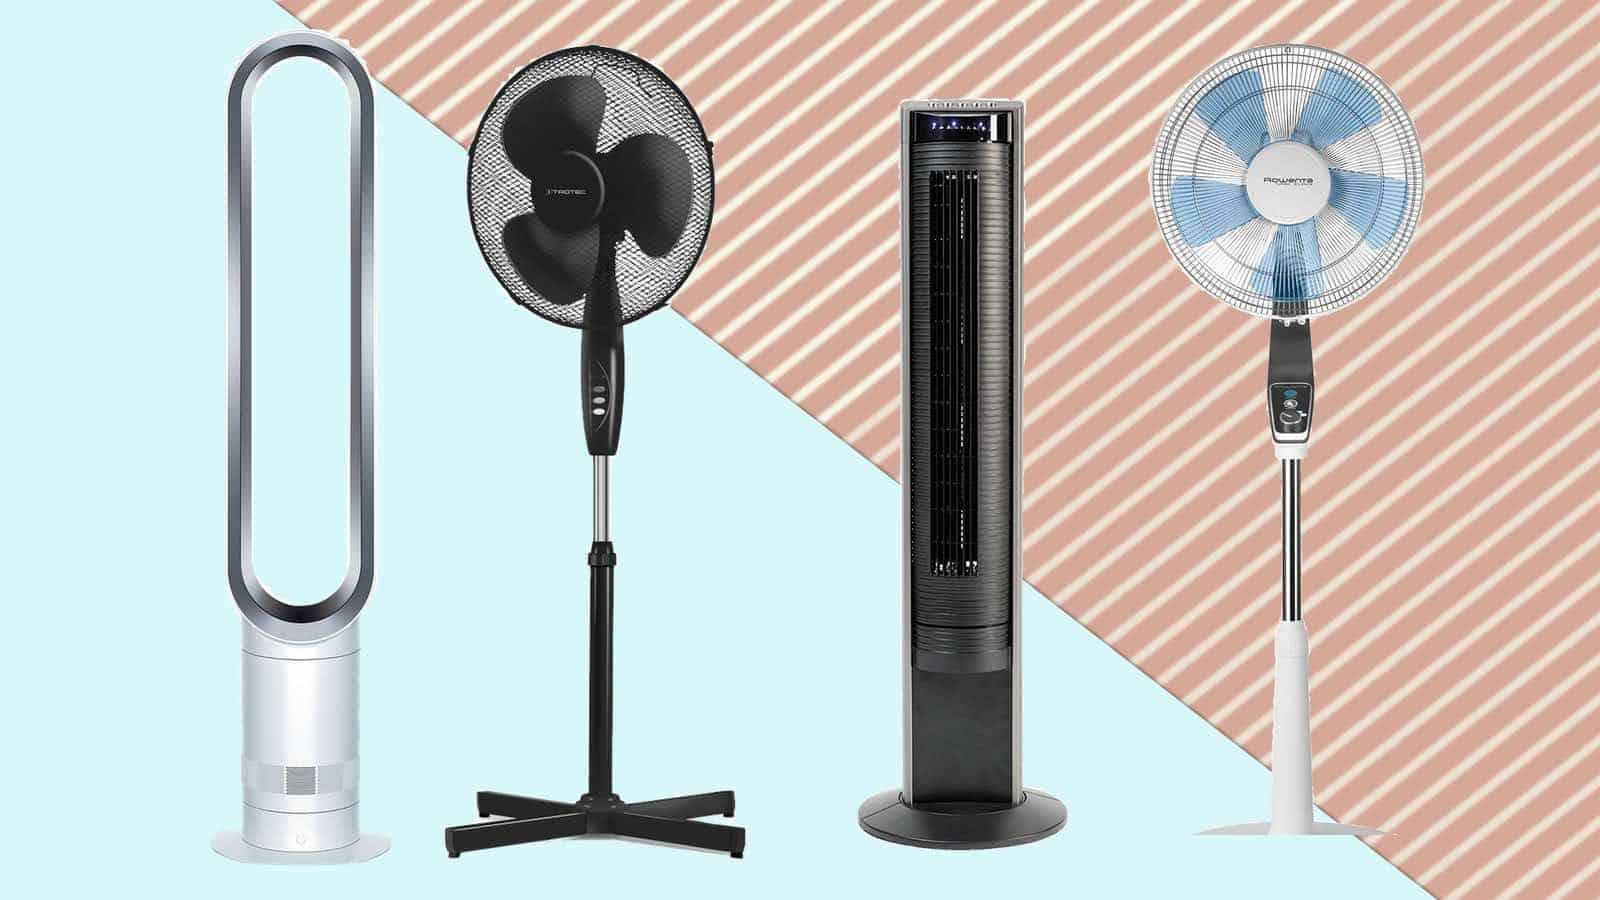 Ventilator Vergleich 19: Die 19 besten Ventilatoren